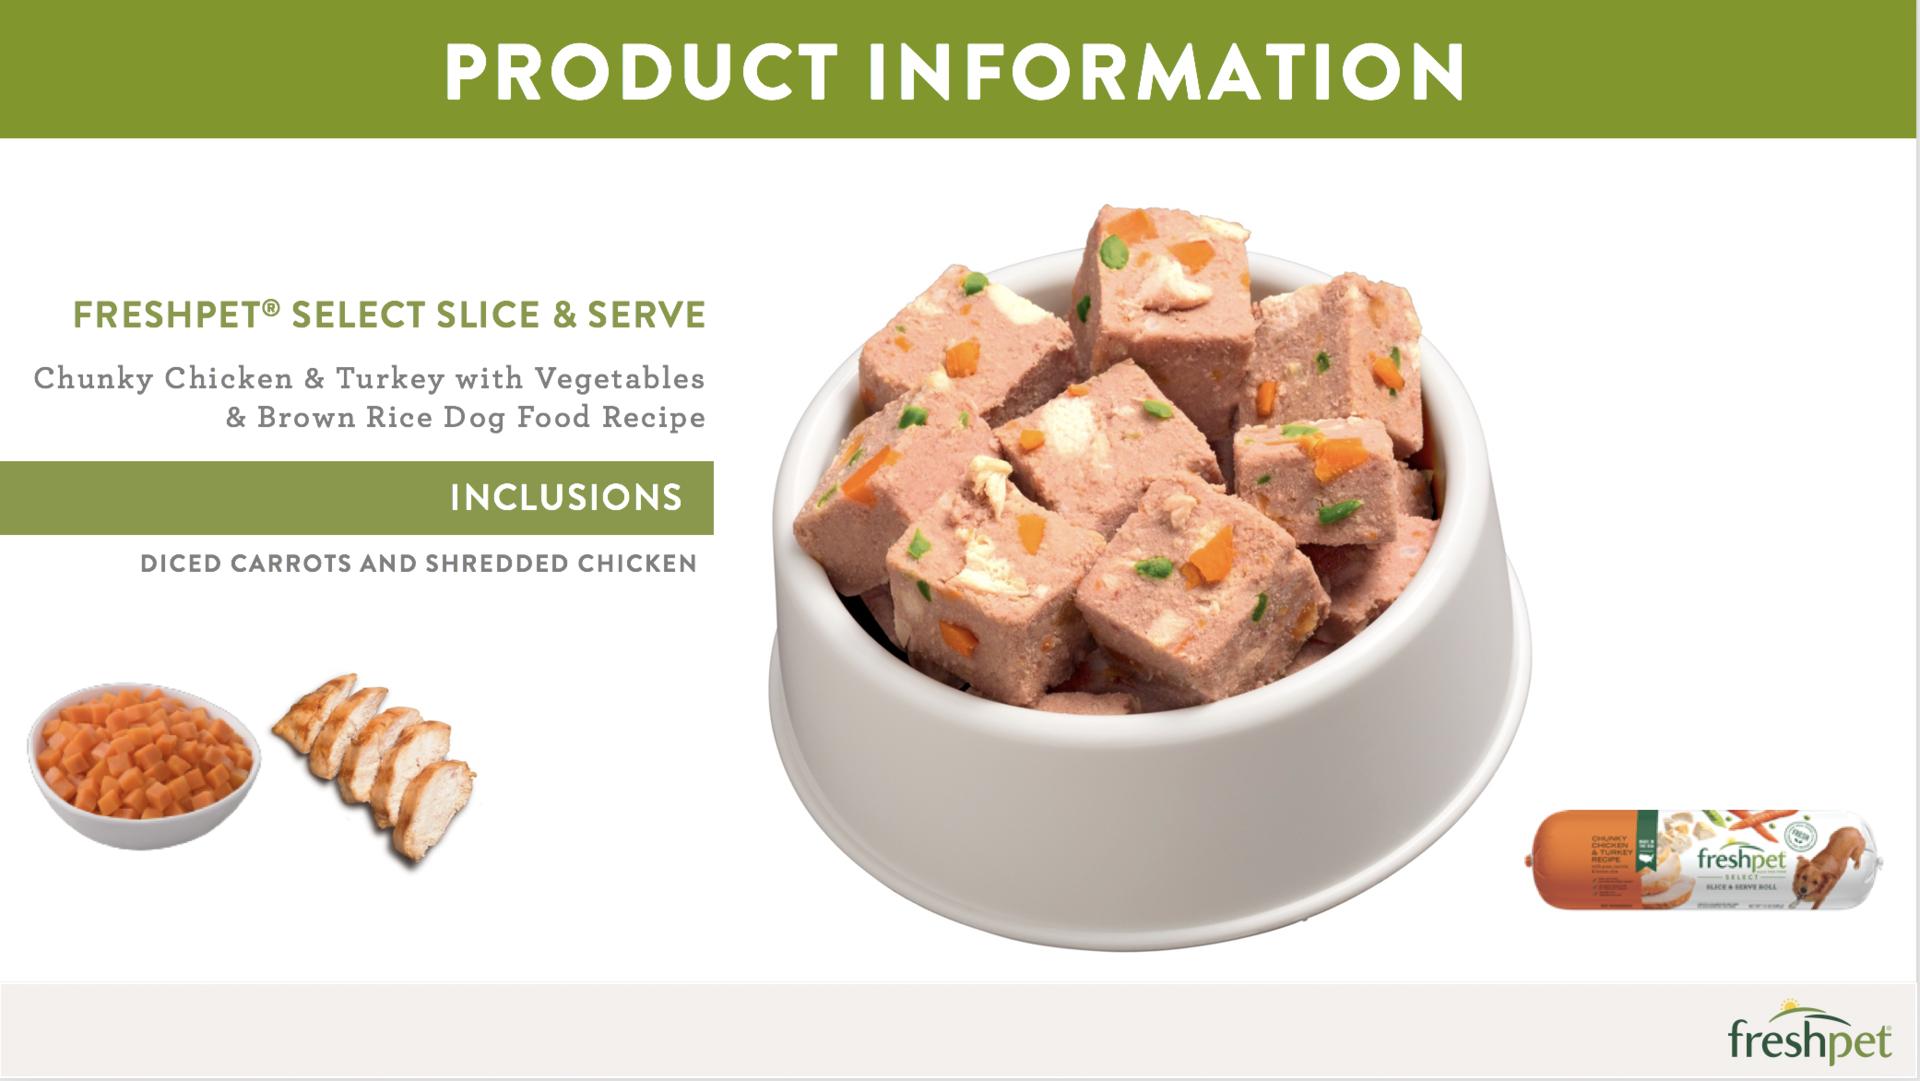 Freshpet - the real fresh pet food! example photo